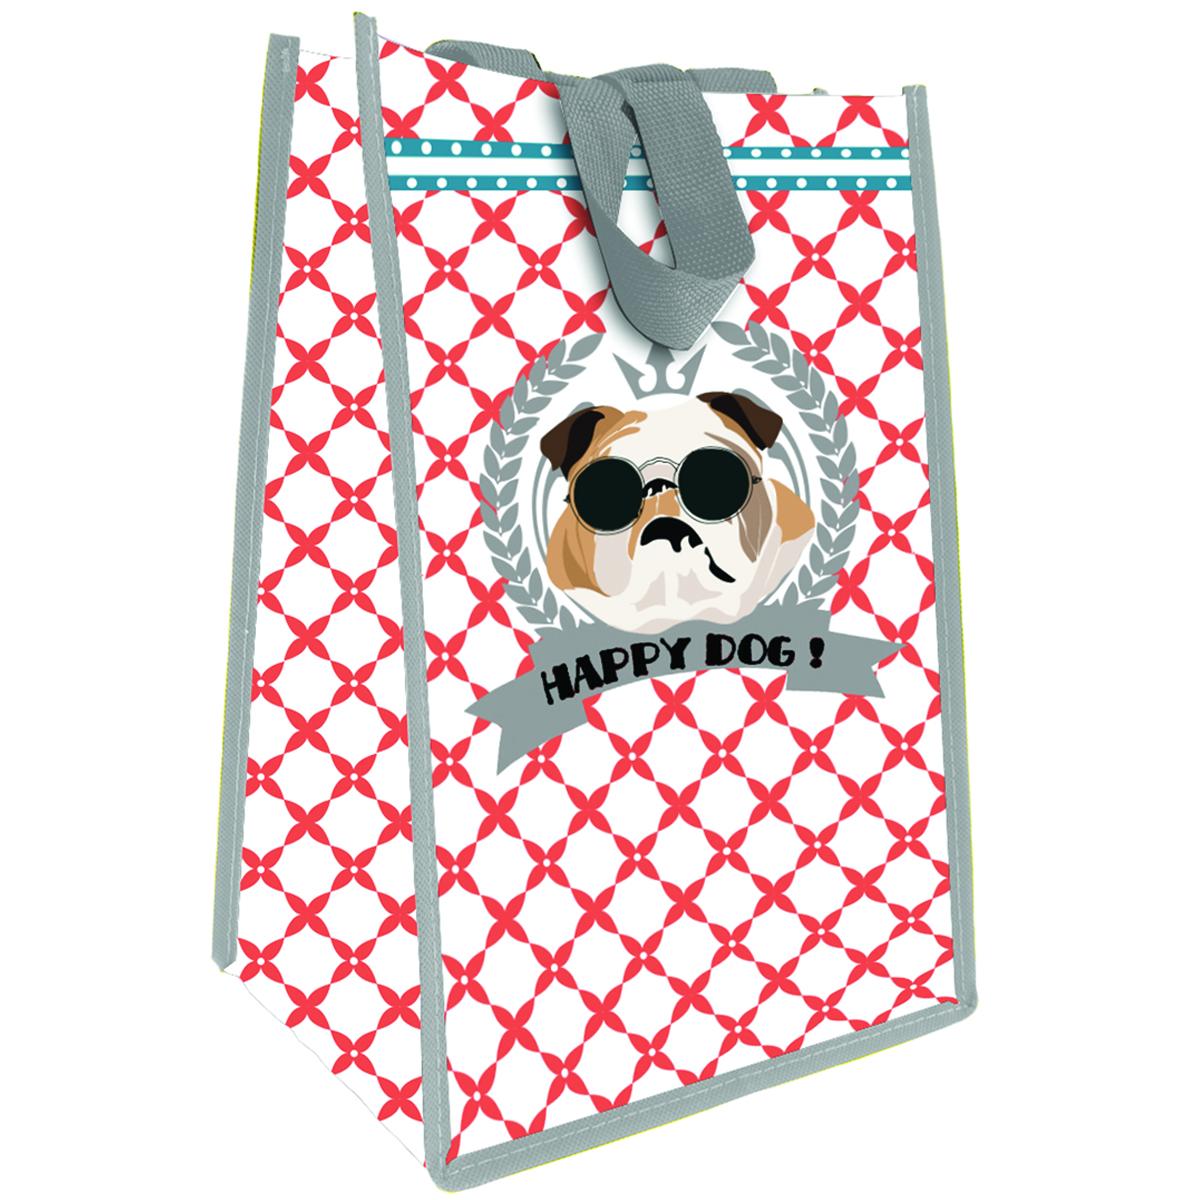 Sac Shopping \'Happy Dog !\' bouledogue - 35x25x19 cm - [Q3382]